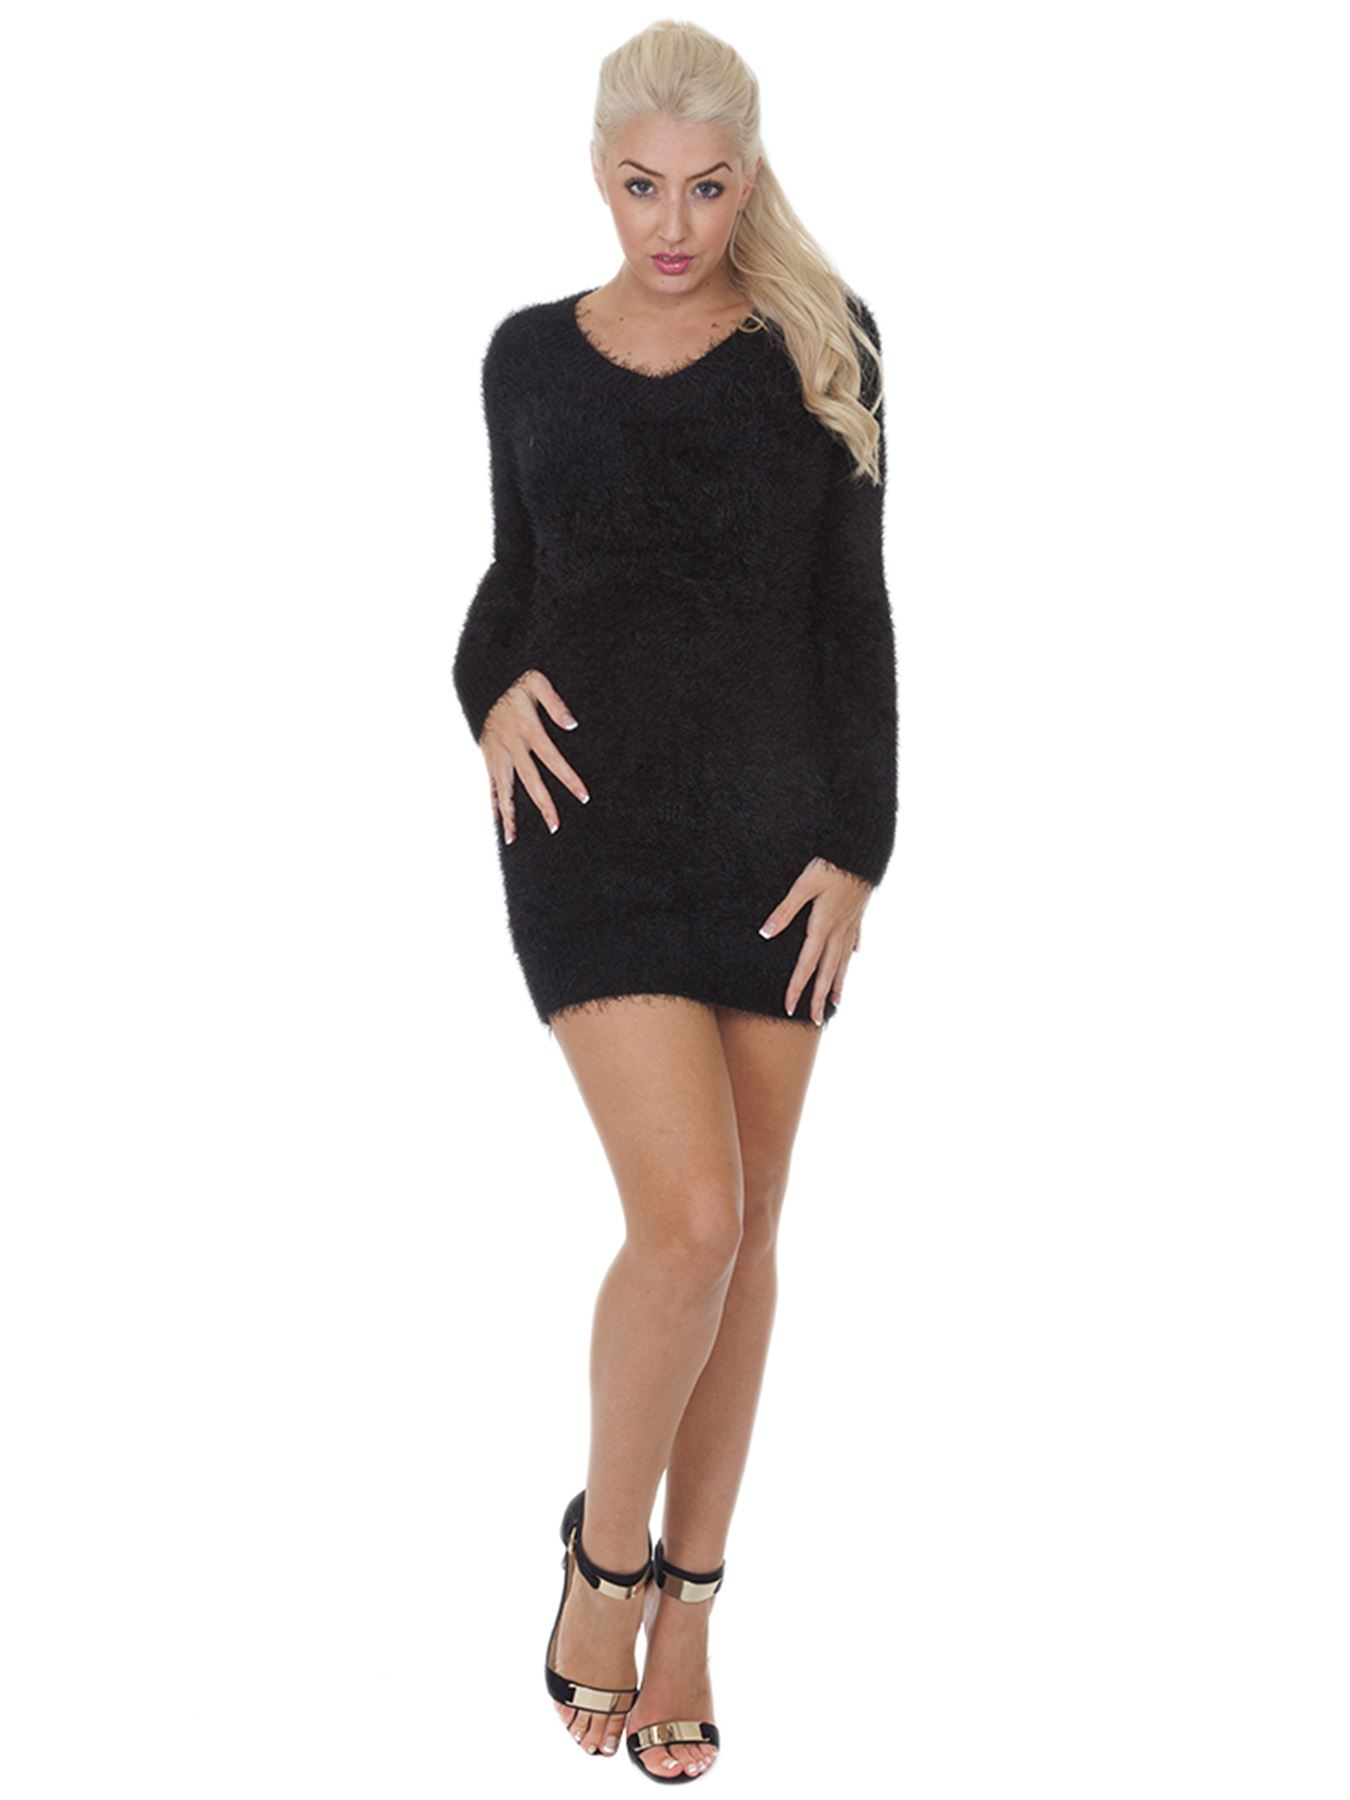 Pull-Femme-Femmes-Tricote-Cardigans-Plain-Tricot-Moelleux-Col-V-Manches-Longues miniature 9